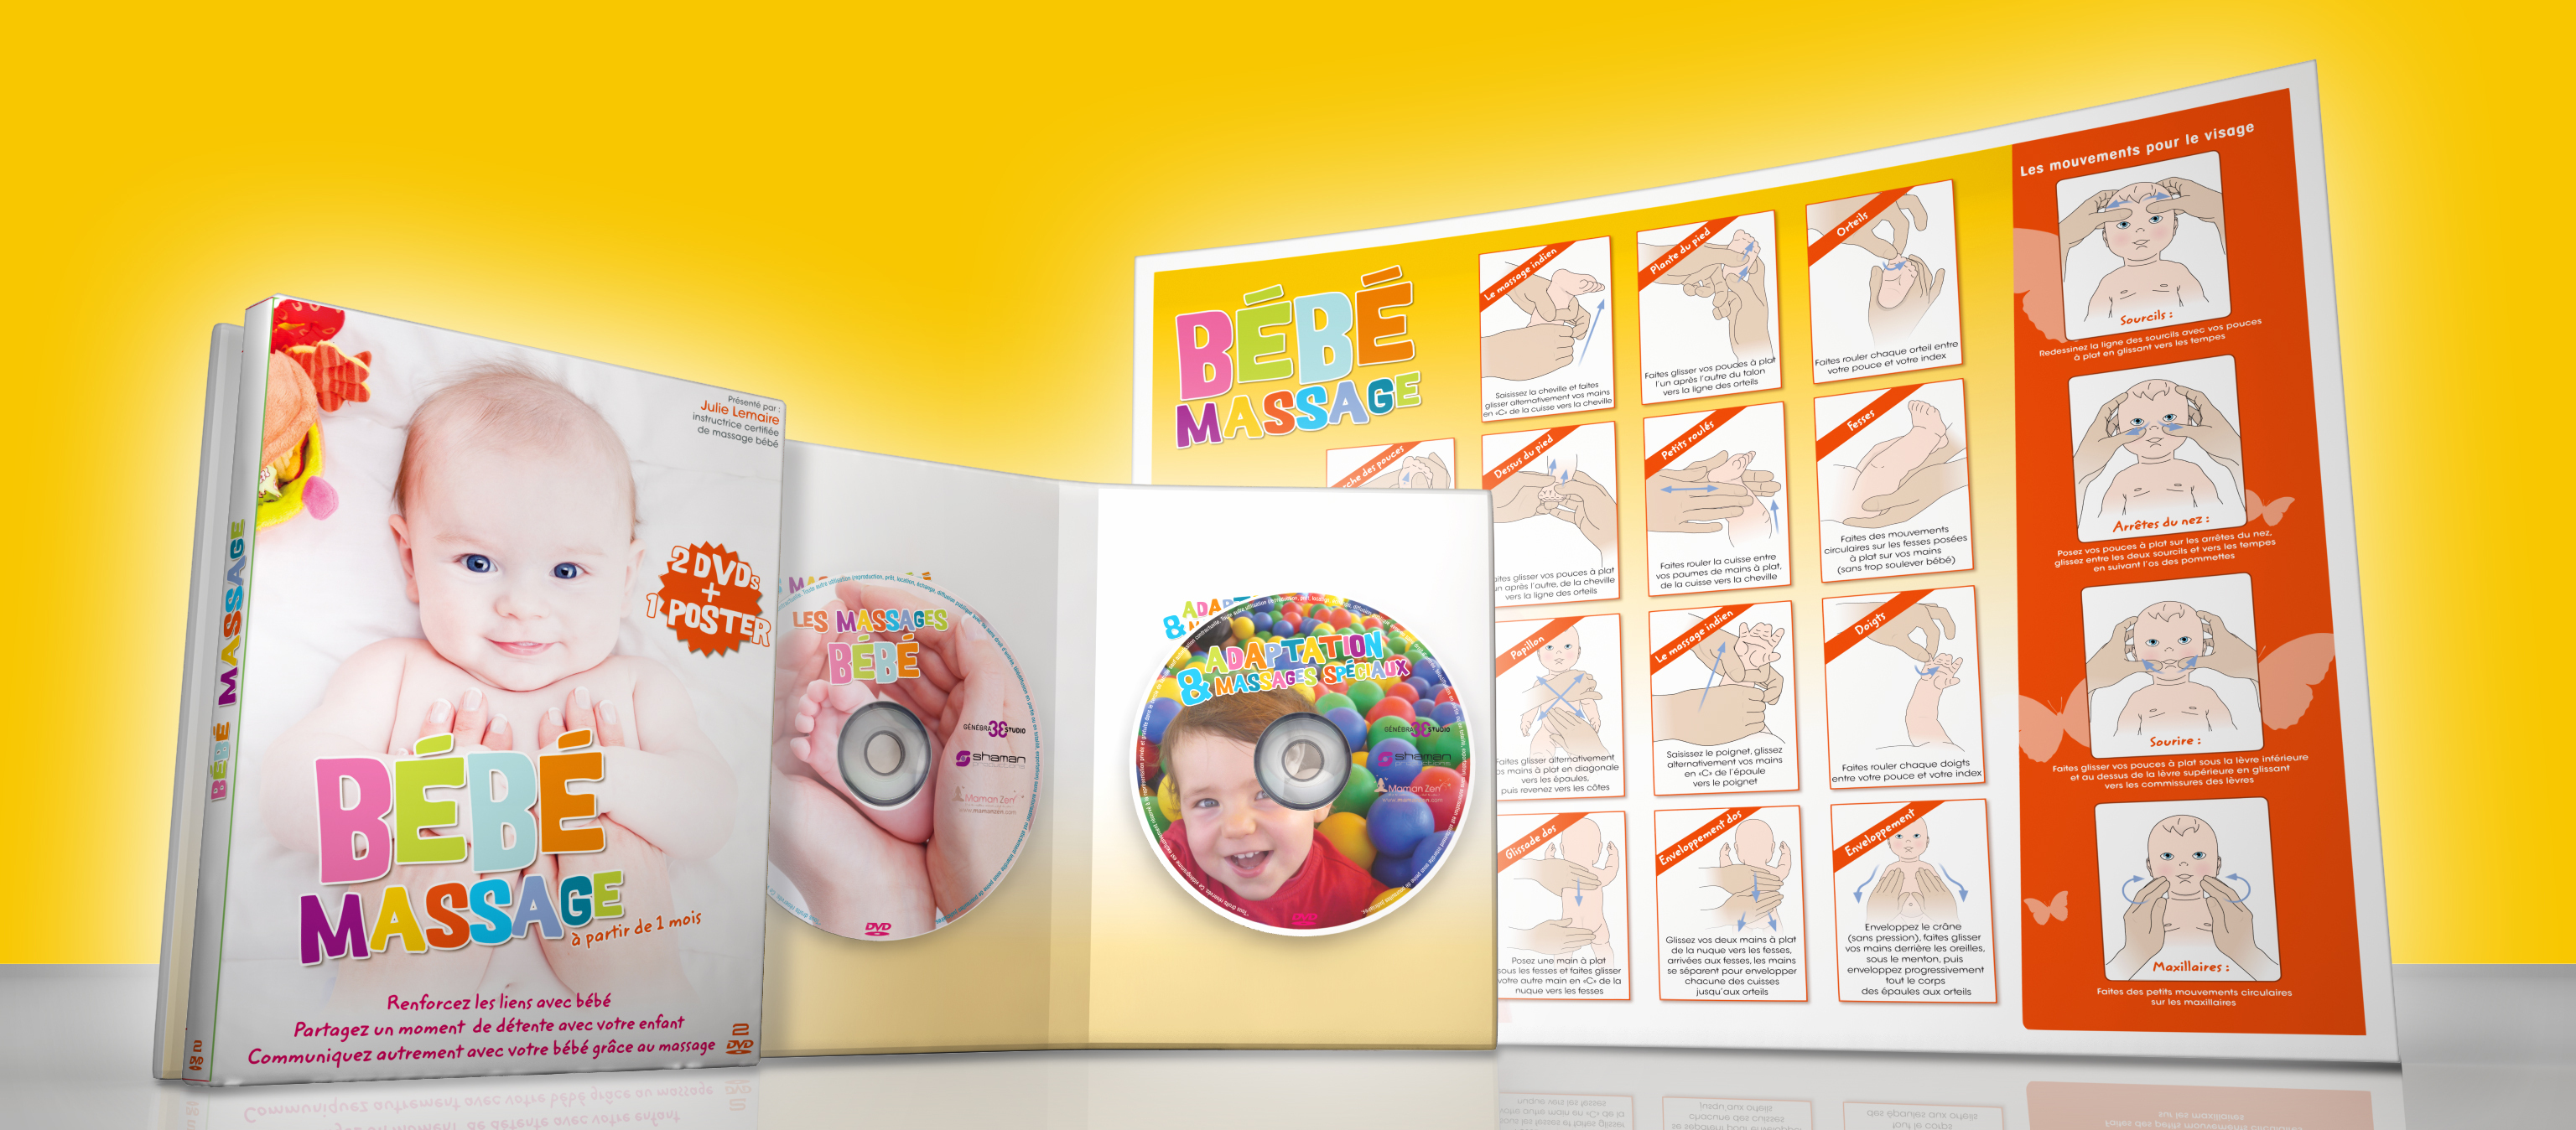 BEBE MASSAGE - 2 DVD + POSTER